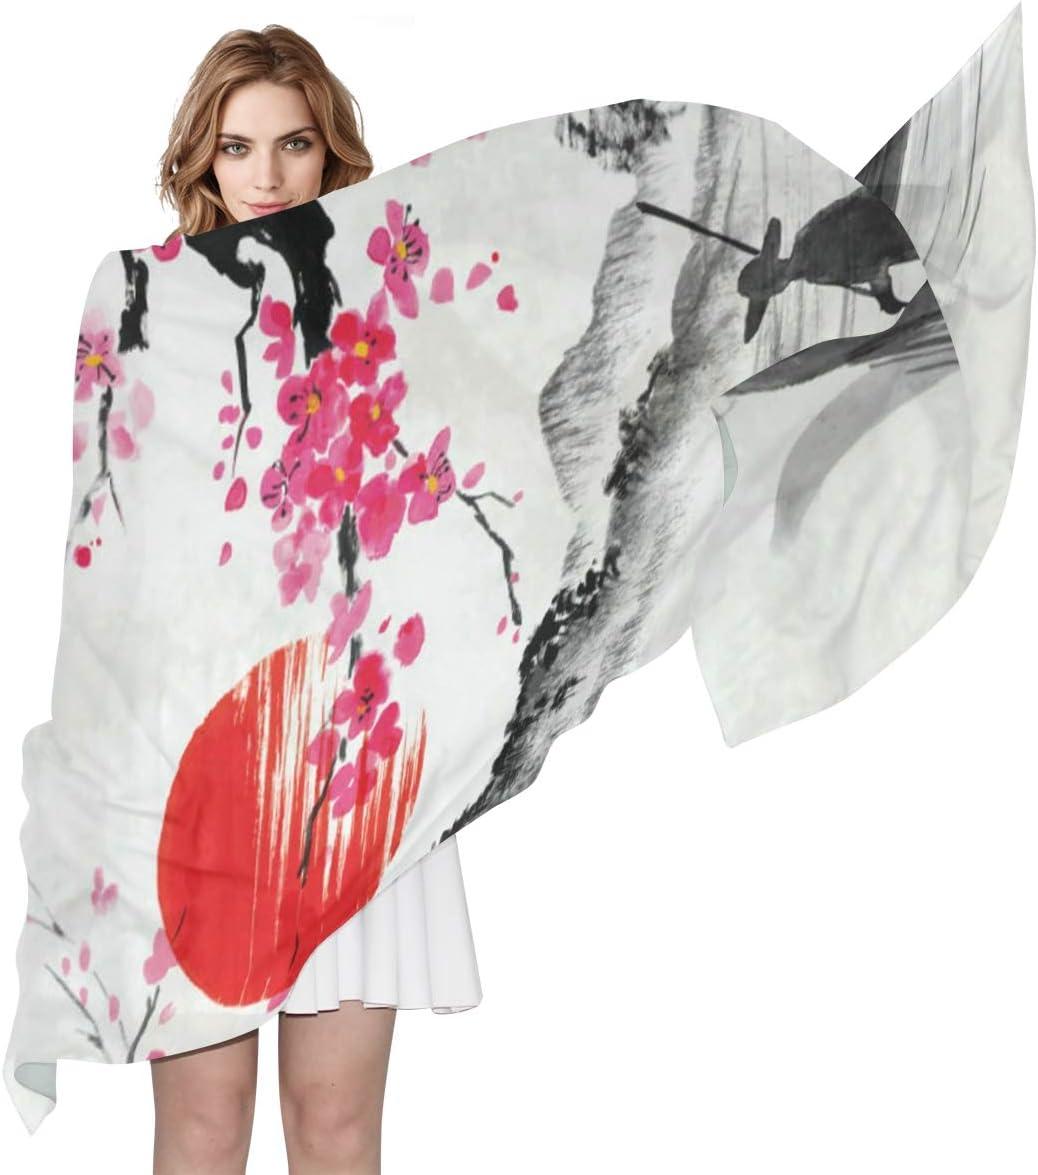 AUUXVA Fashion Scarf Watercolor Japan Cherry Blossom Ship Sunset Long Lightweight Sunscreen Scarf Shawl Wrap Muffler Neckerchief for Women Men